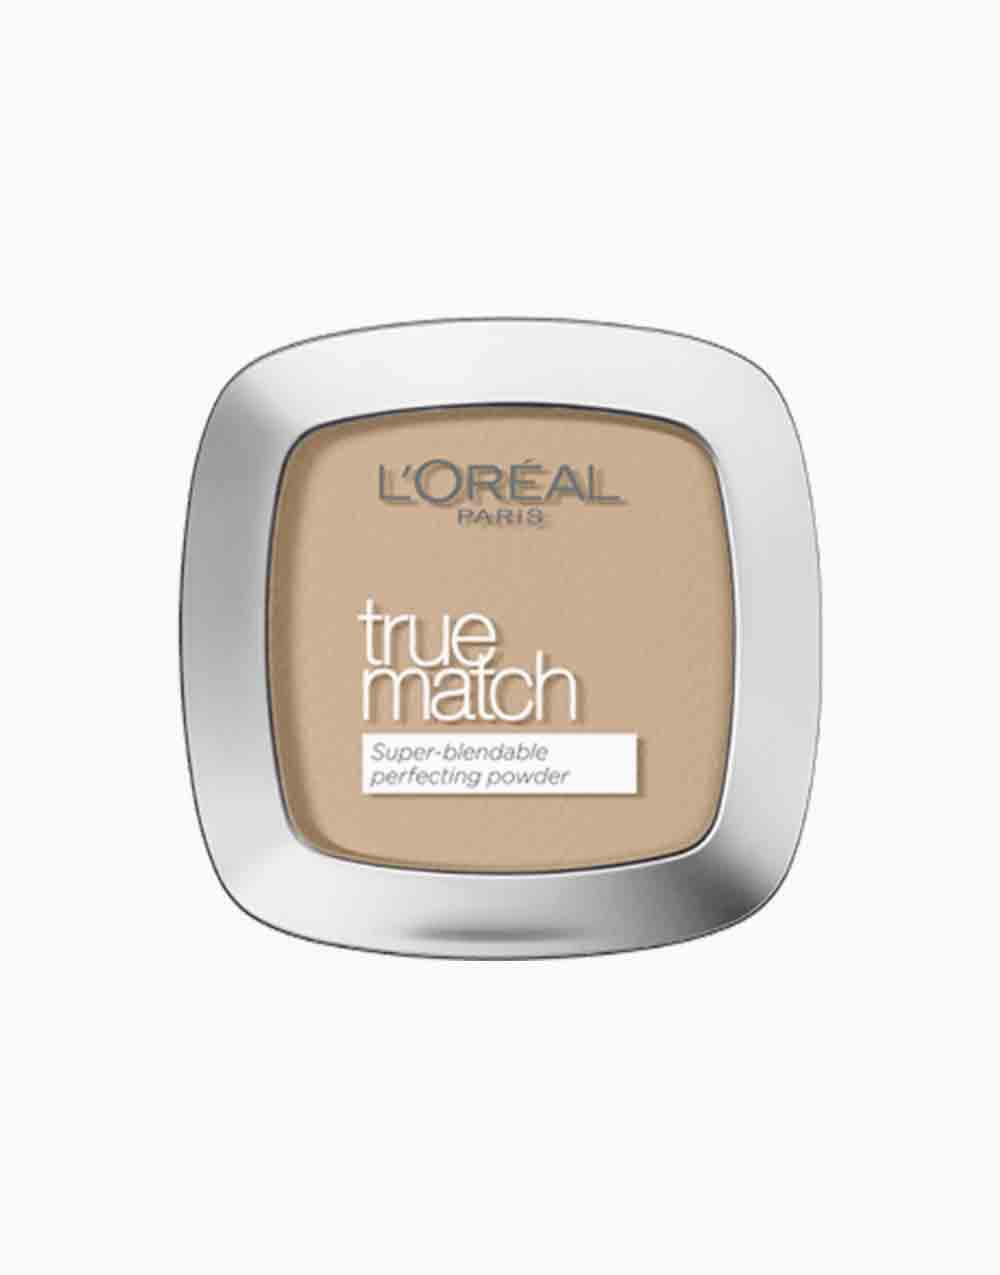 True Match Skin-Caring Skin-Matching Pressed Powder by L'Oréal Paris | 4D Golden Natural